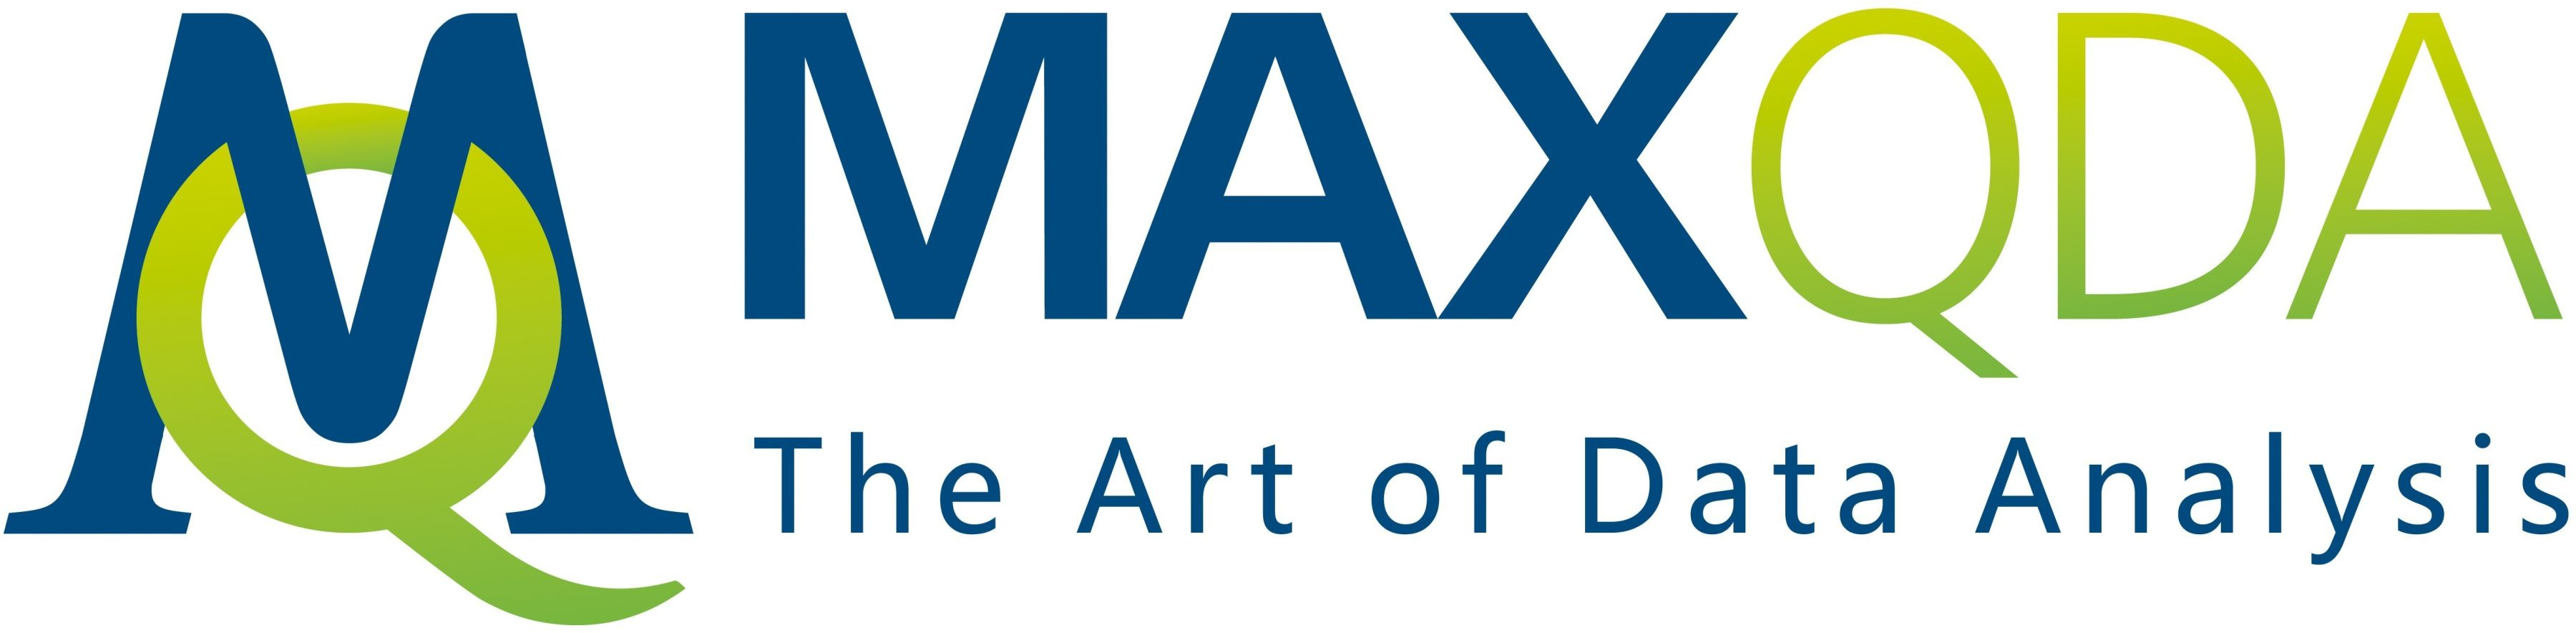 MAXQDA Standard dla Firm i Instytucji - Certyfikaty Rzetelna Firma i Adobe Gold Reseller